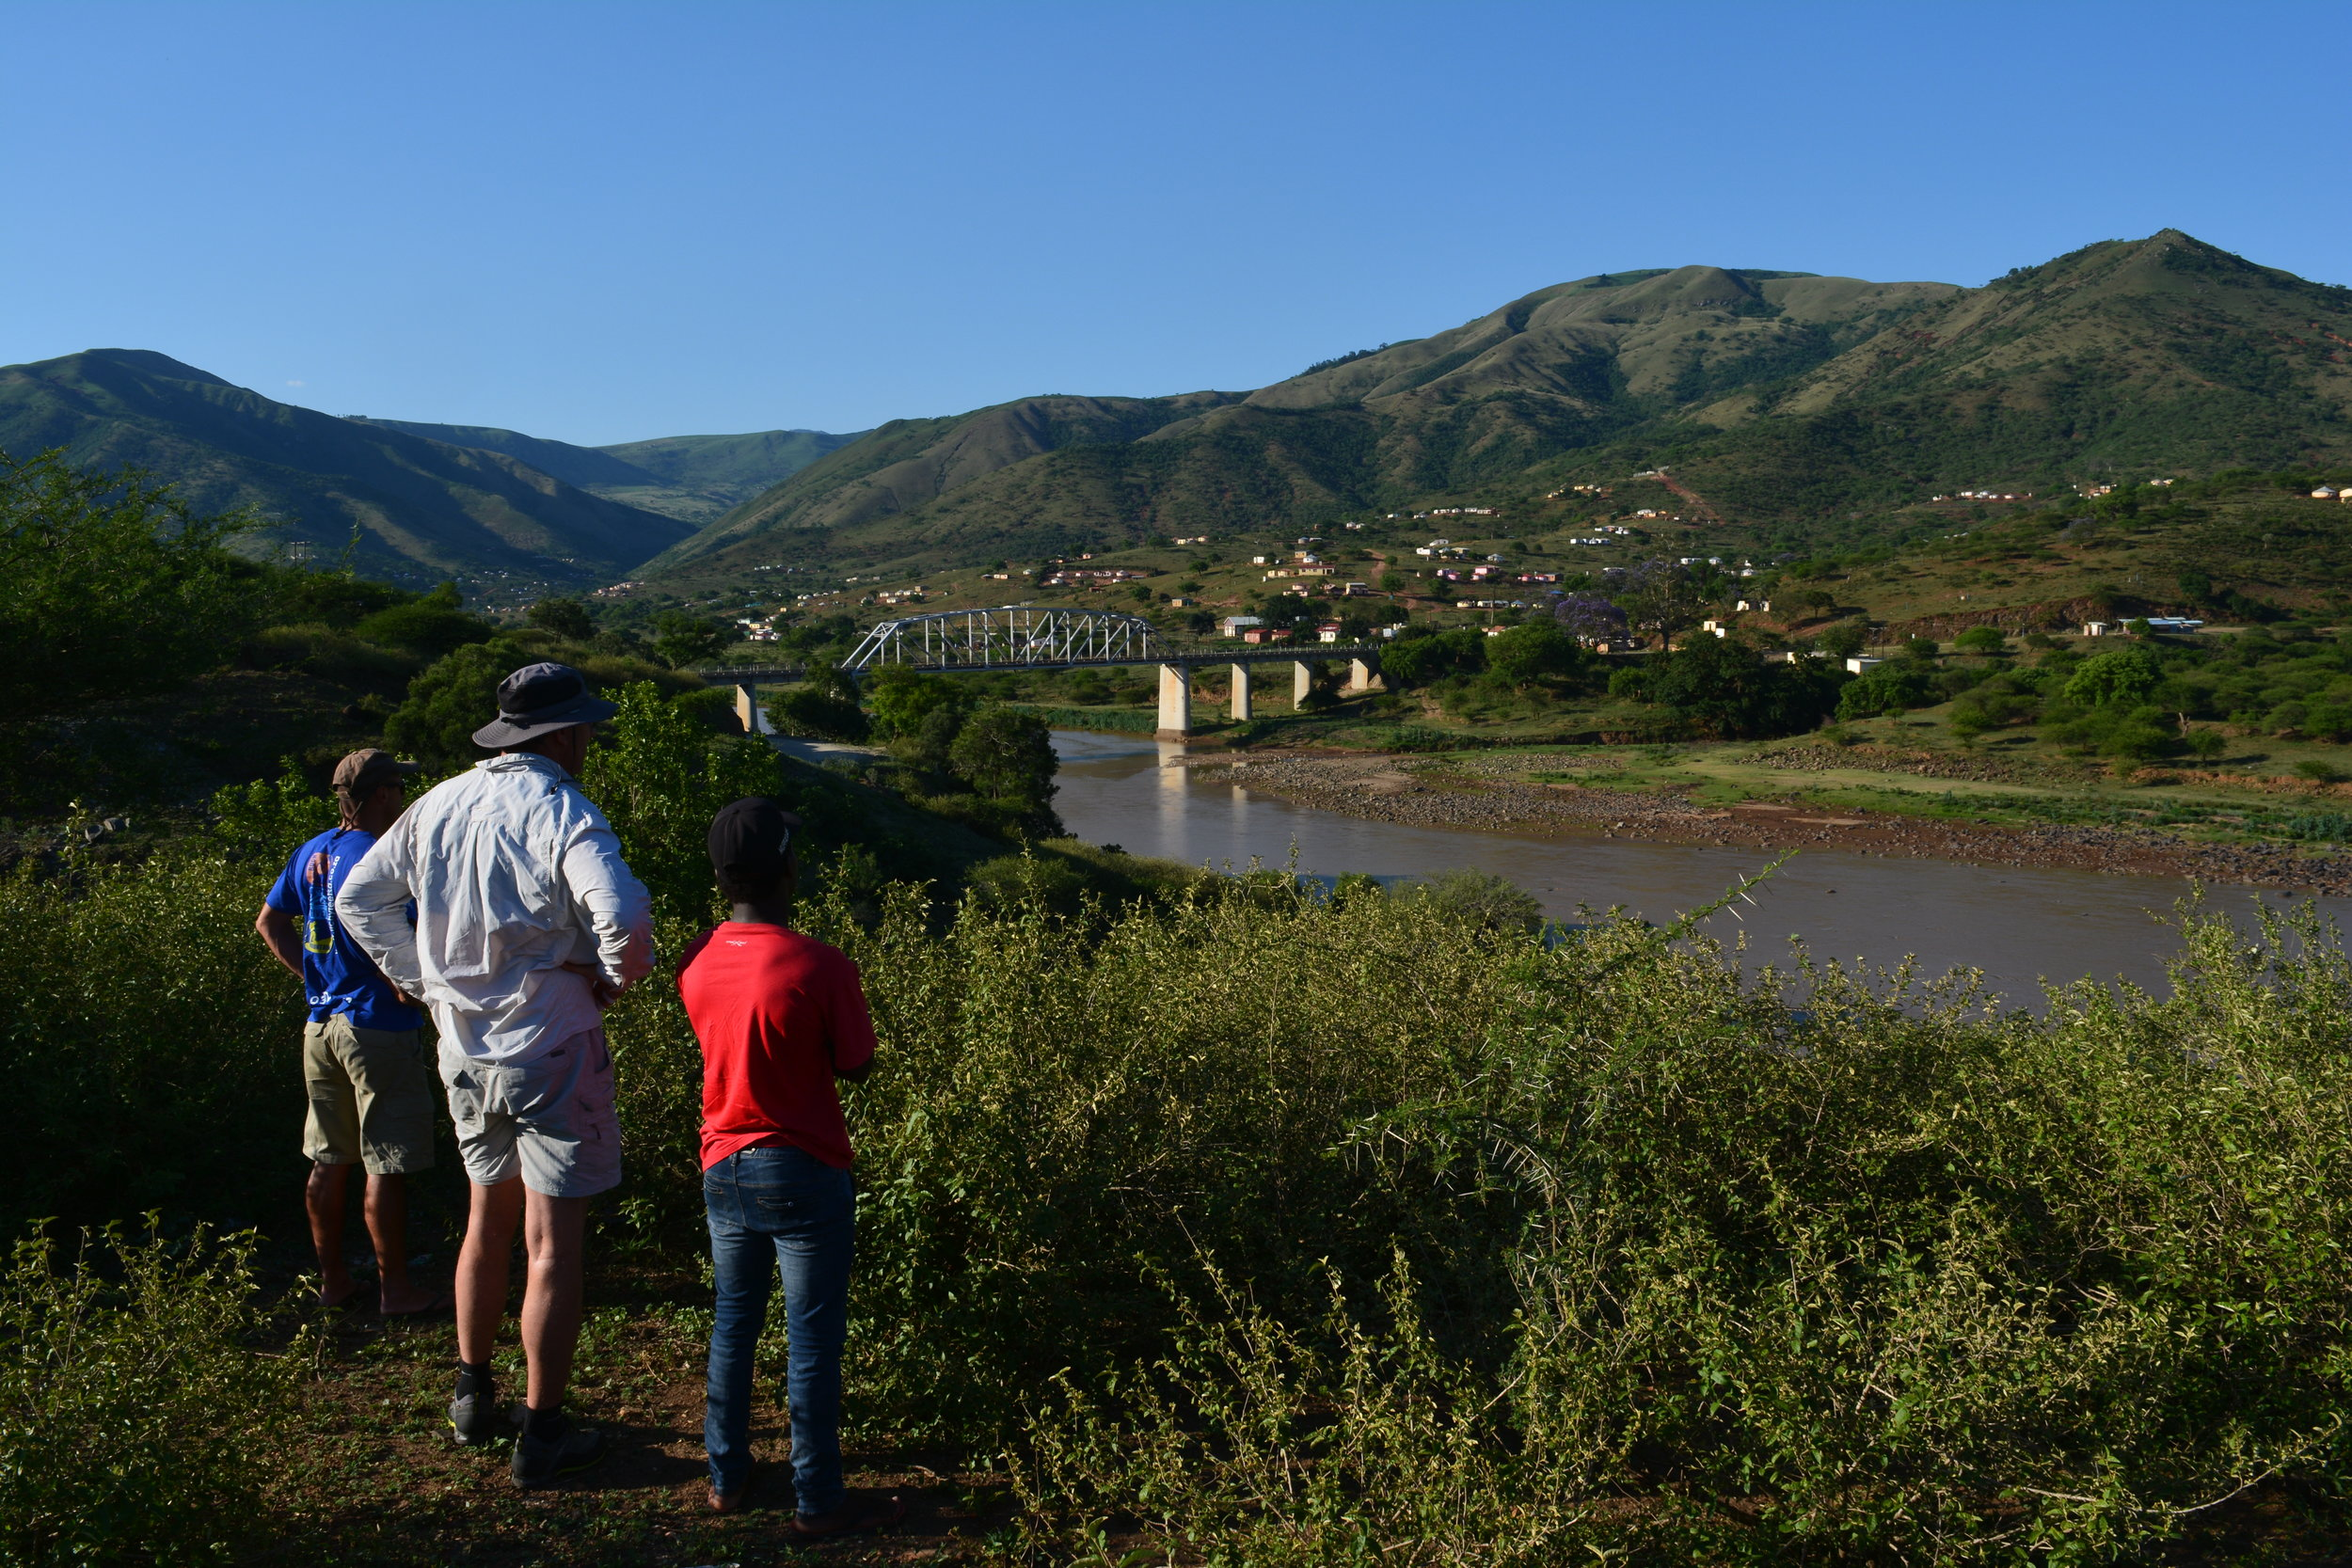 Gustav Greffrath, Hugh du Preez, and Godfrey Tshumah ponder the water level of the Tugela River, looking down at Jameson's Drift.